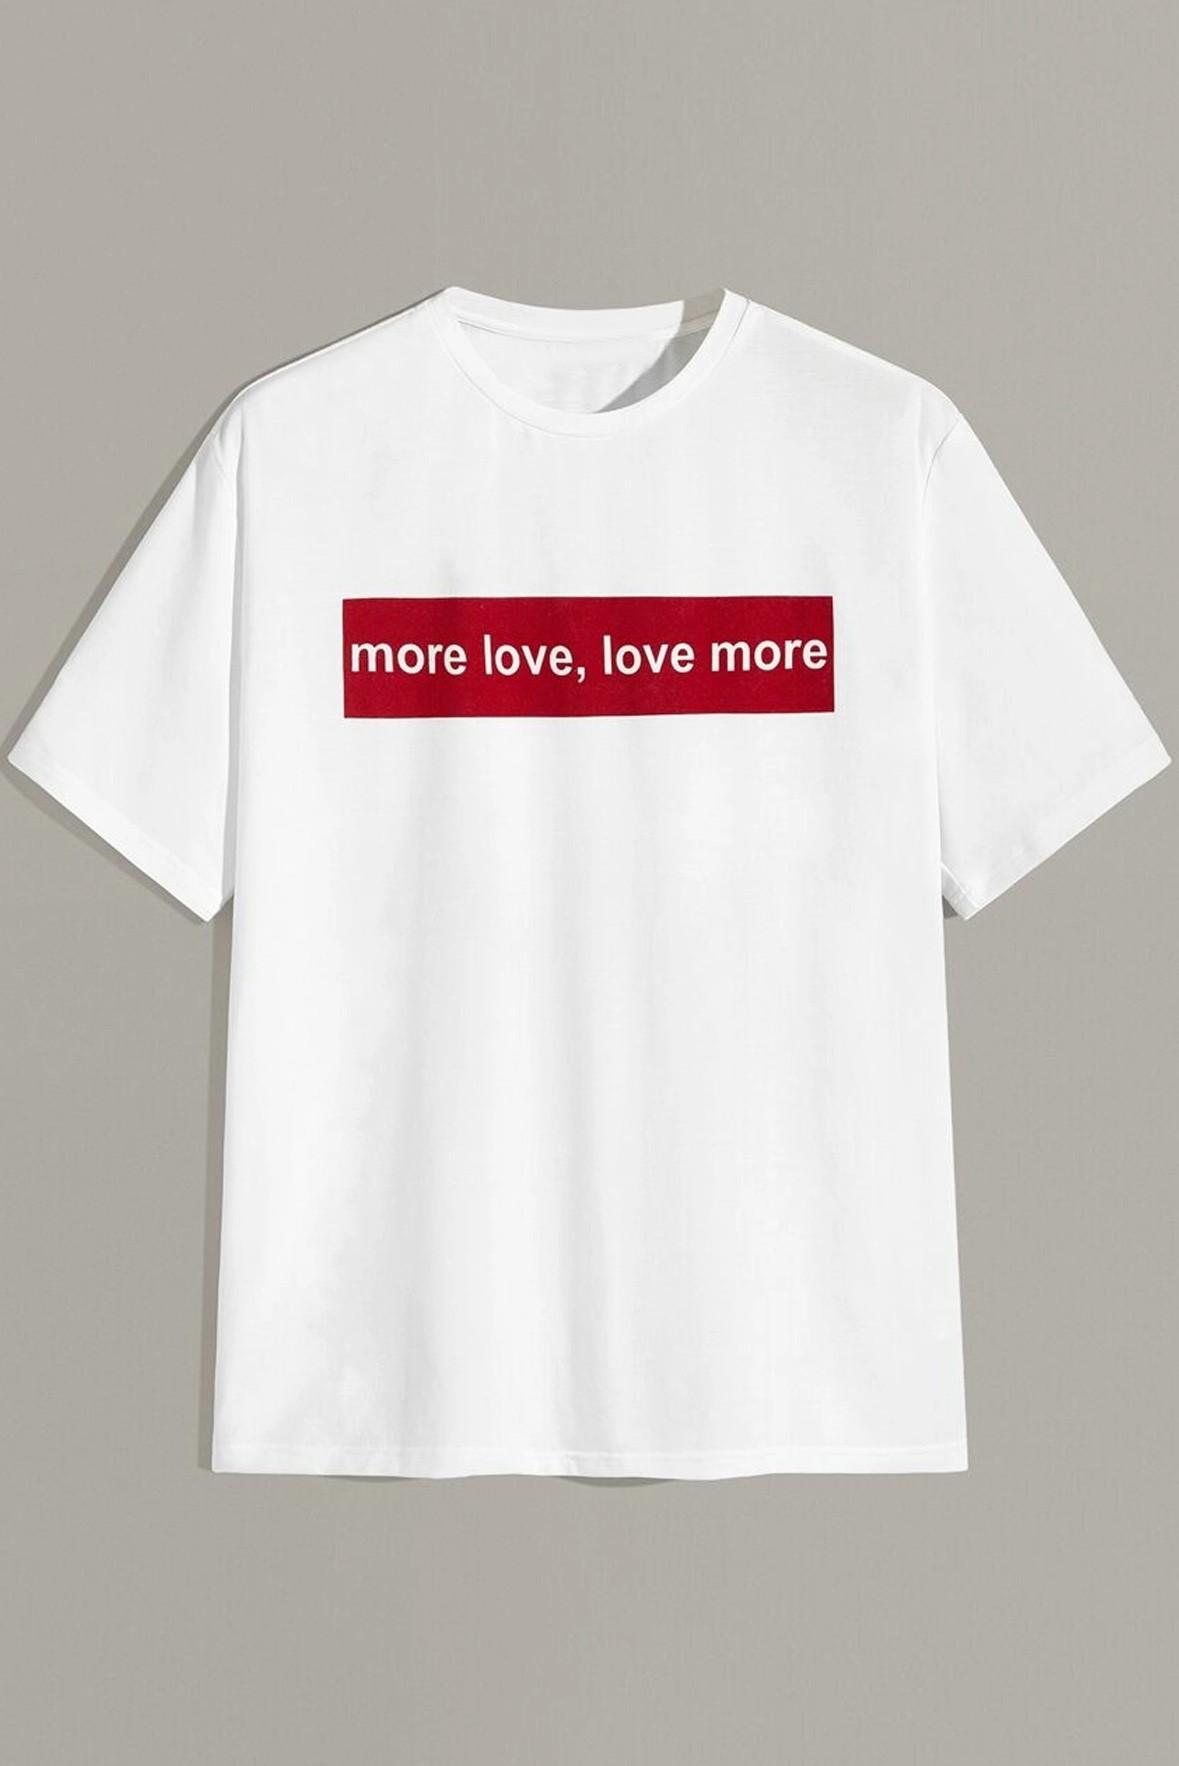 More love, love more t-shirt